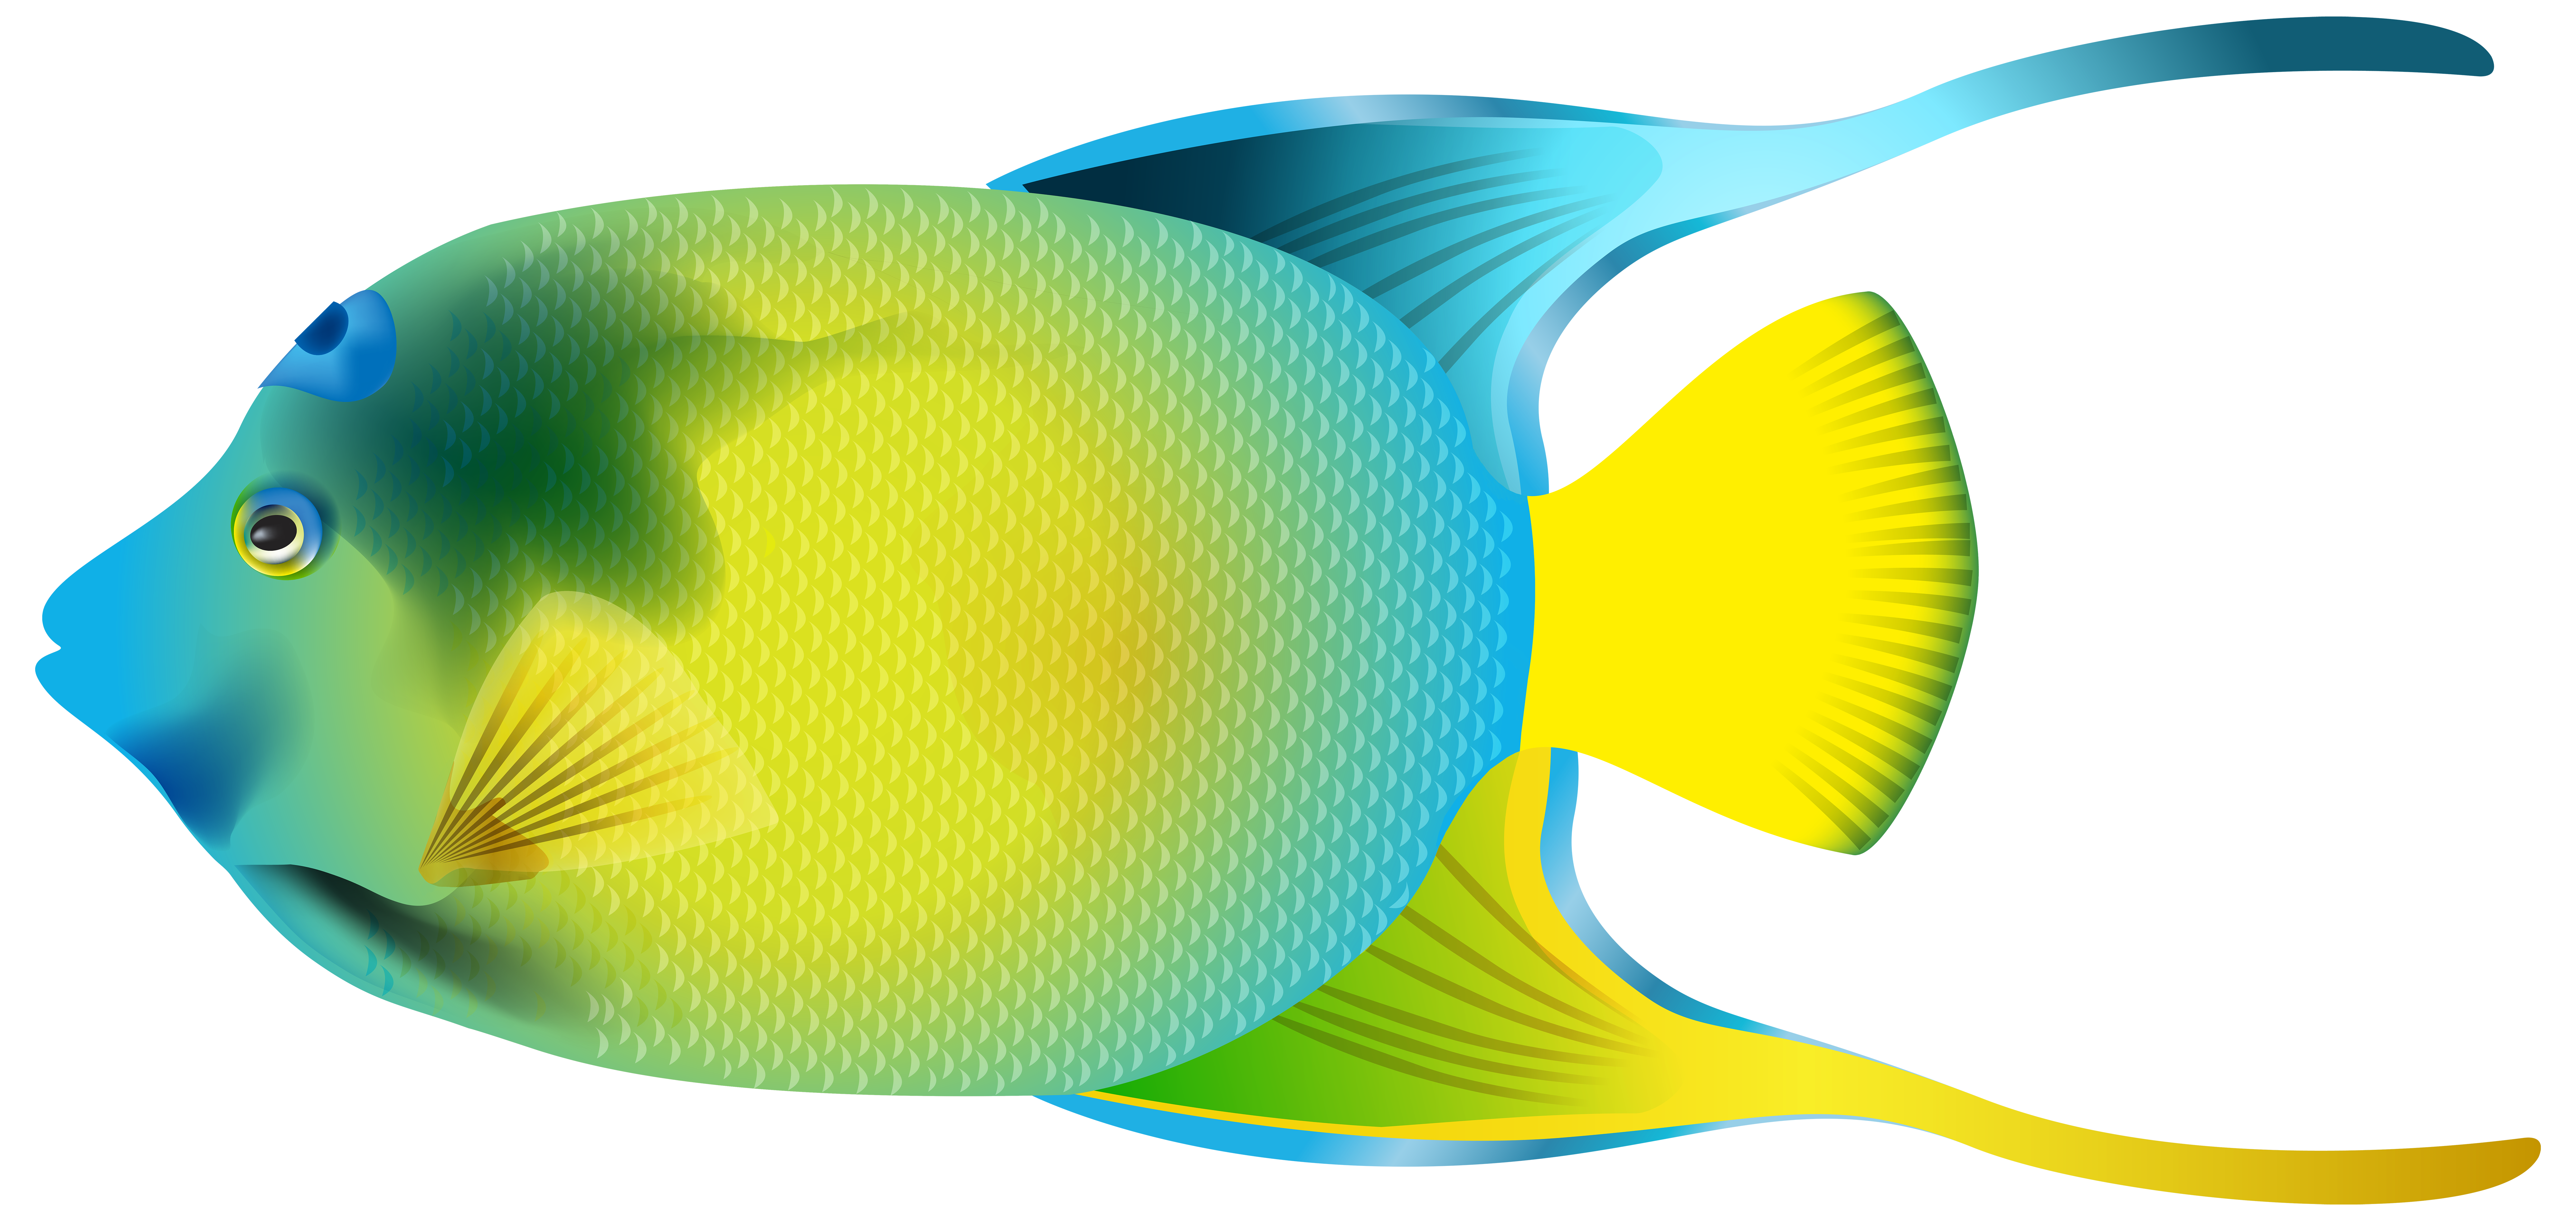 8000x3792 Queen Angelfish Png Transparent Clip Art Imageu200b Gallery